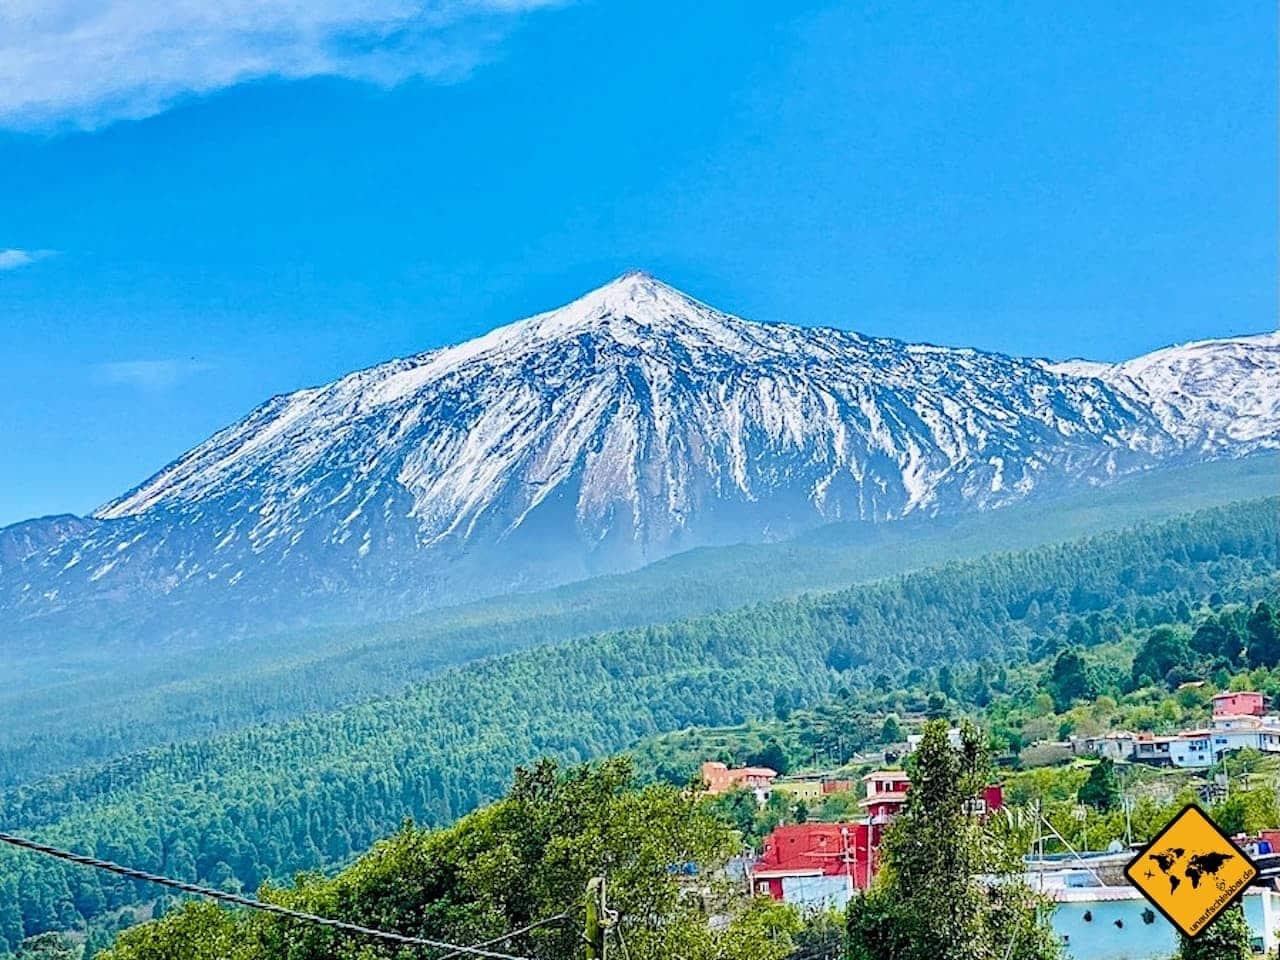 Urlaub auf Teneriffa Teide Vulkan